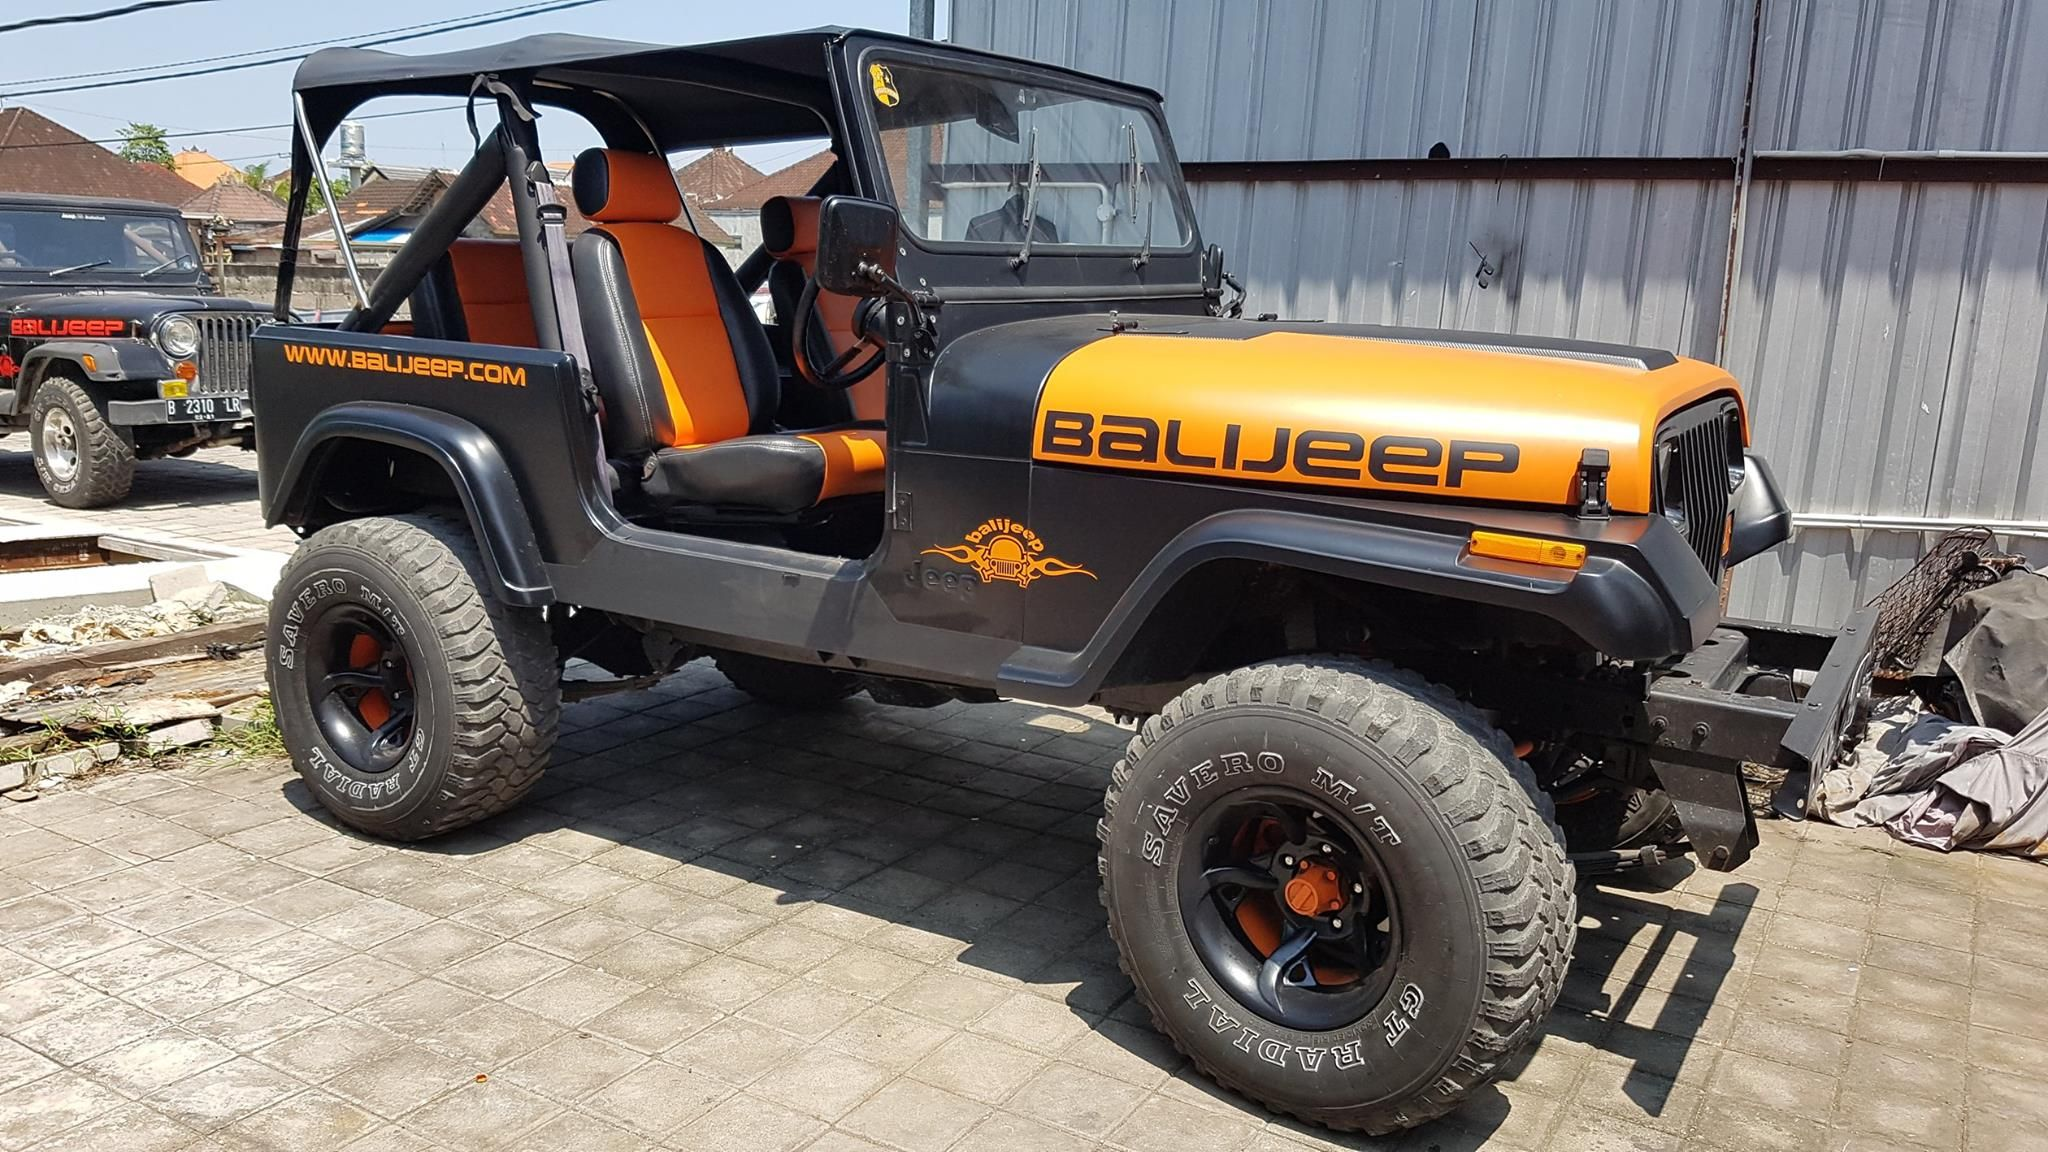 Balijeep Unique 4x4 Rambo Jeep Recreational Vehicles